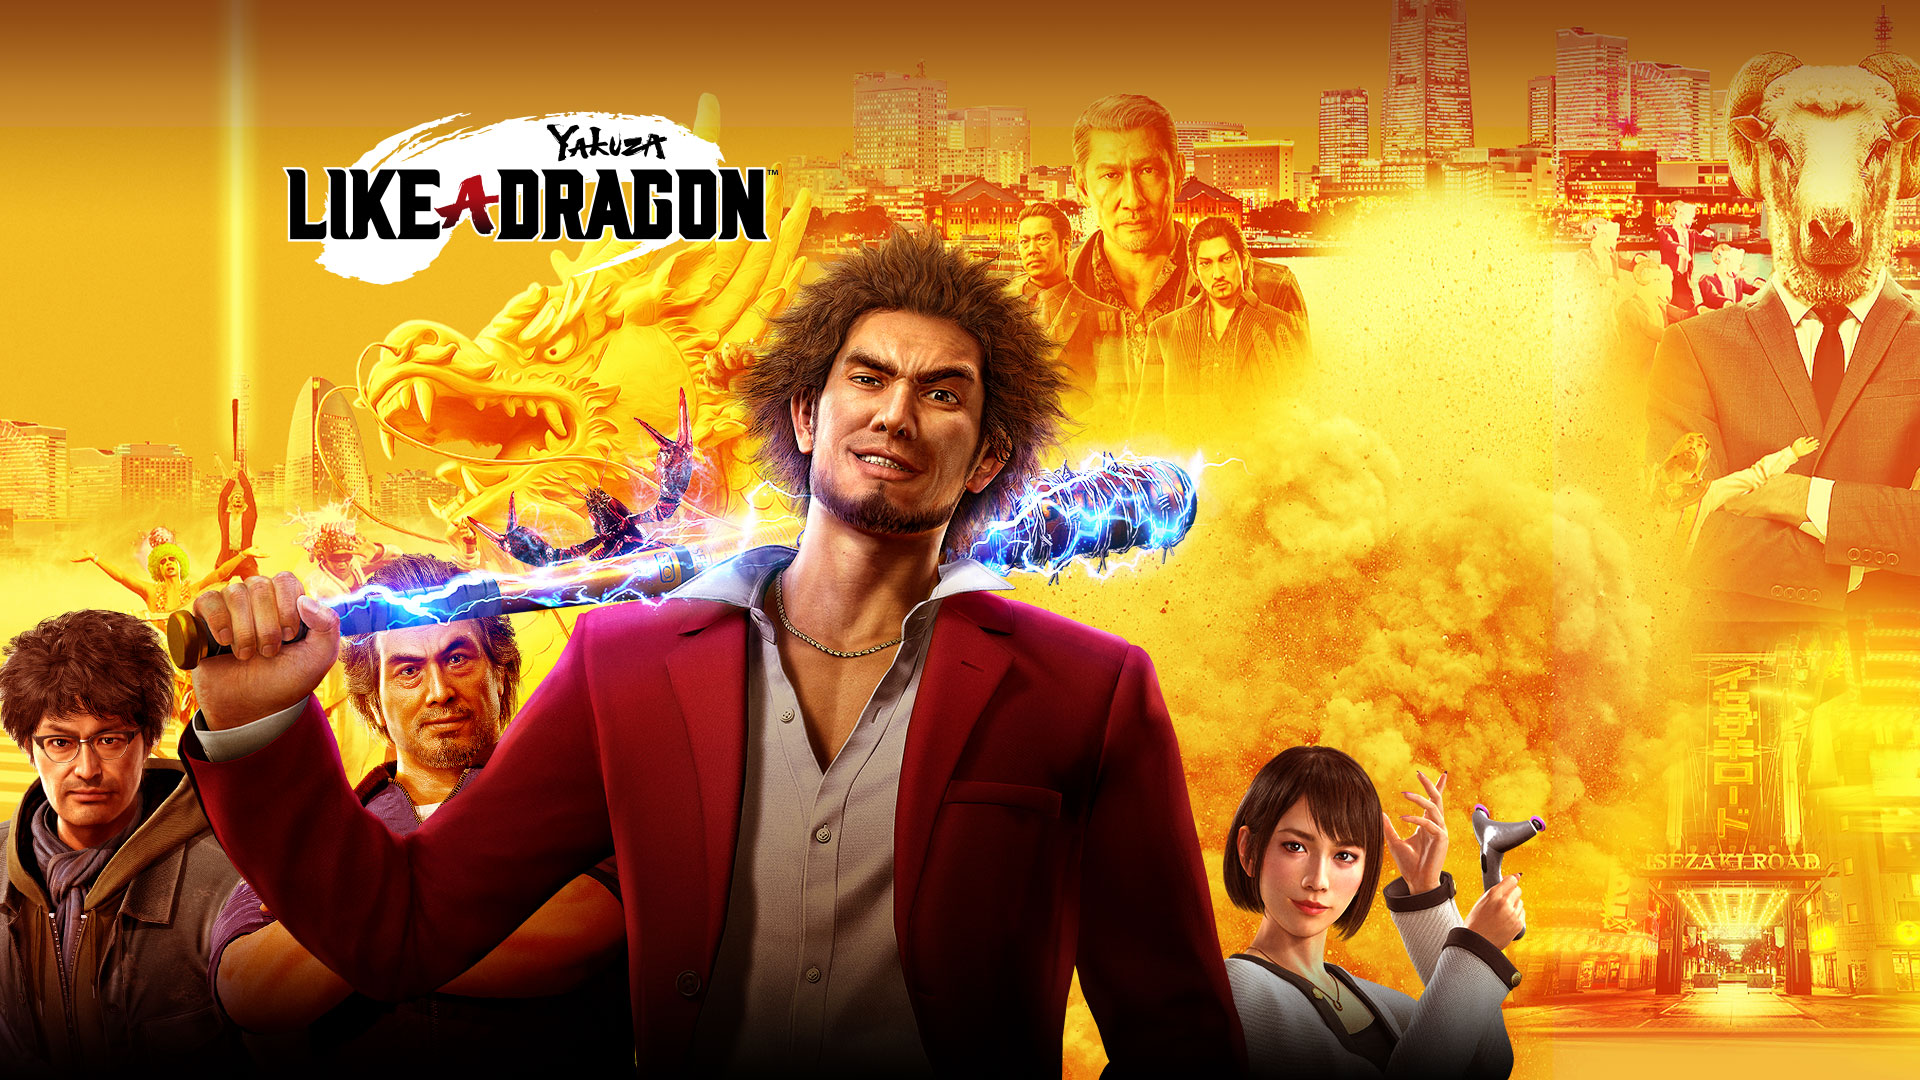 yakuza: like a dragon ps5 gameplay footage